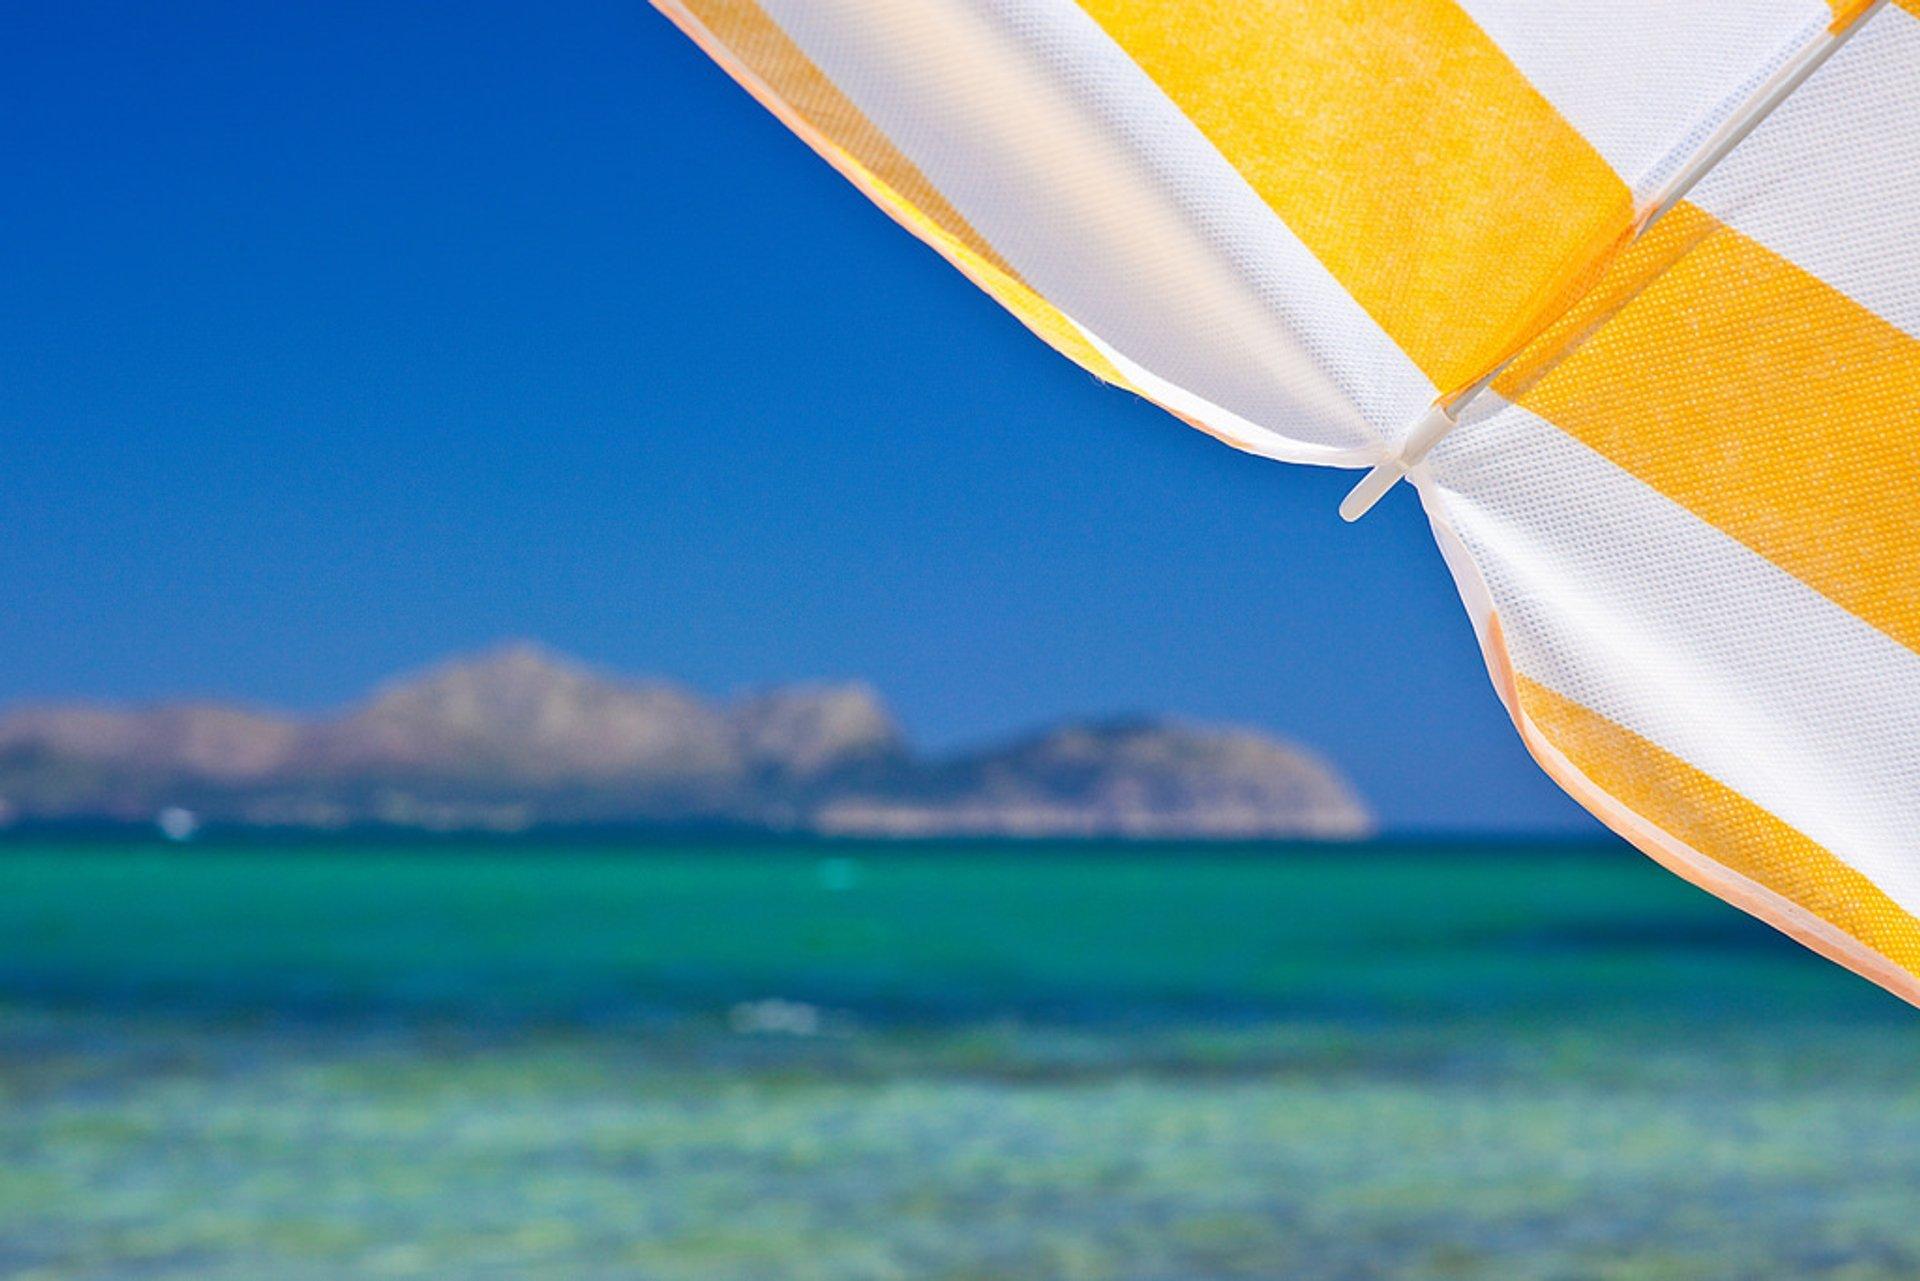 Beach Season in Mallorca 2019 - Best Time